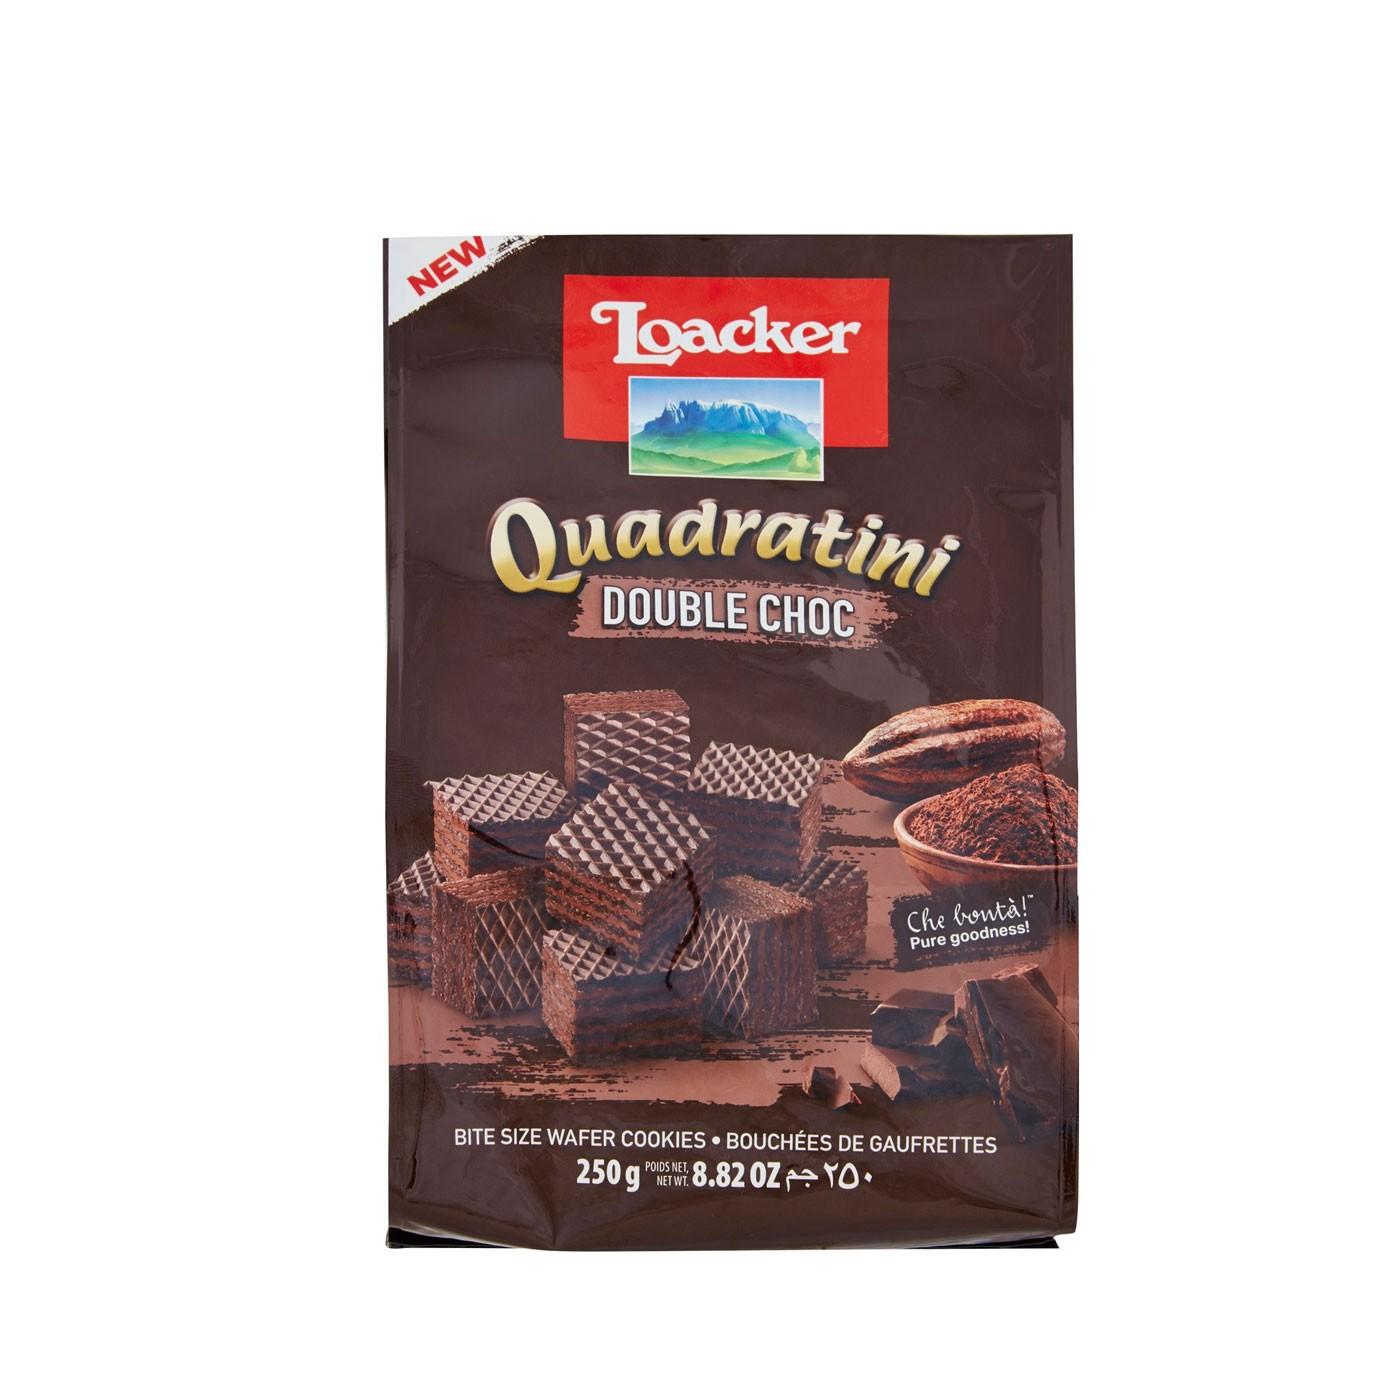 Double Chocolate Quadratini 8.82 oz